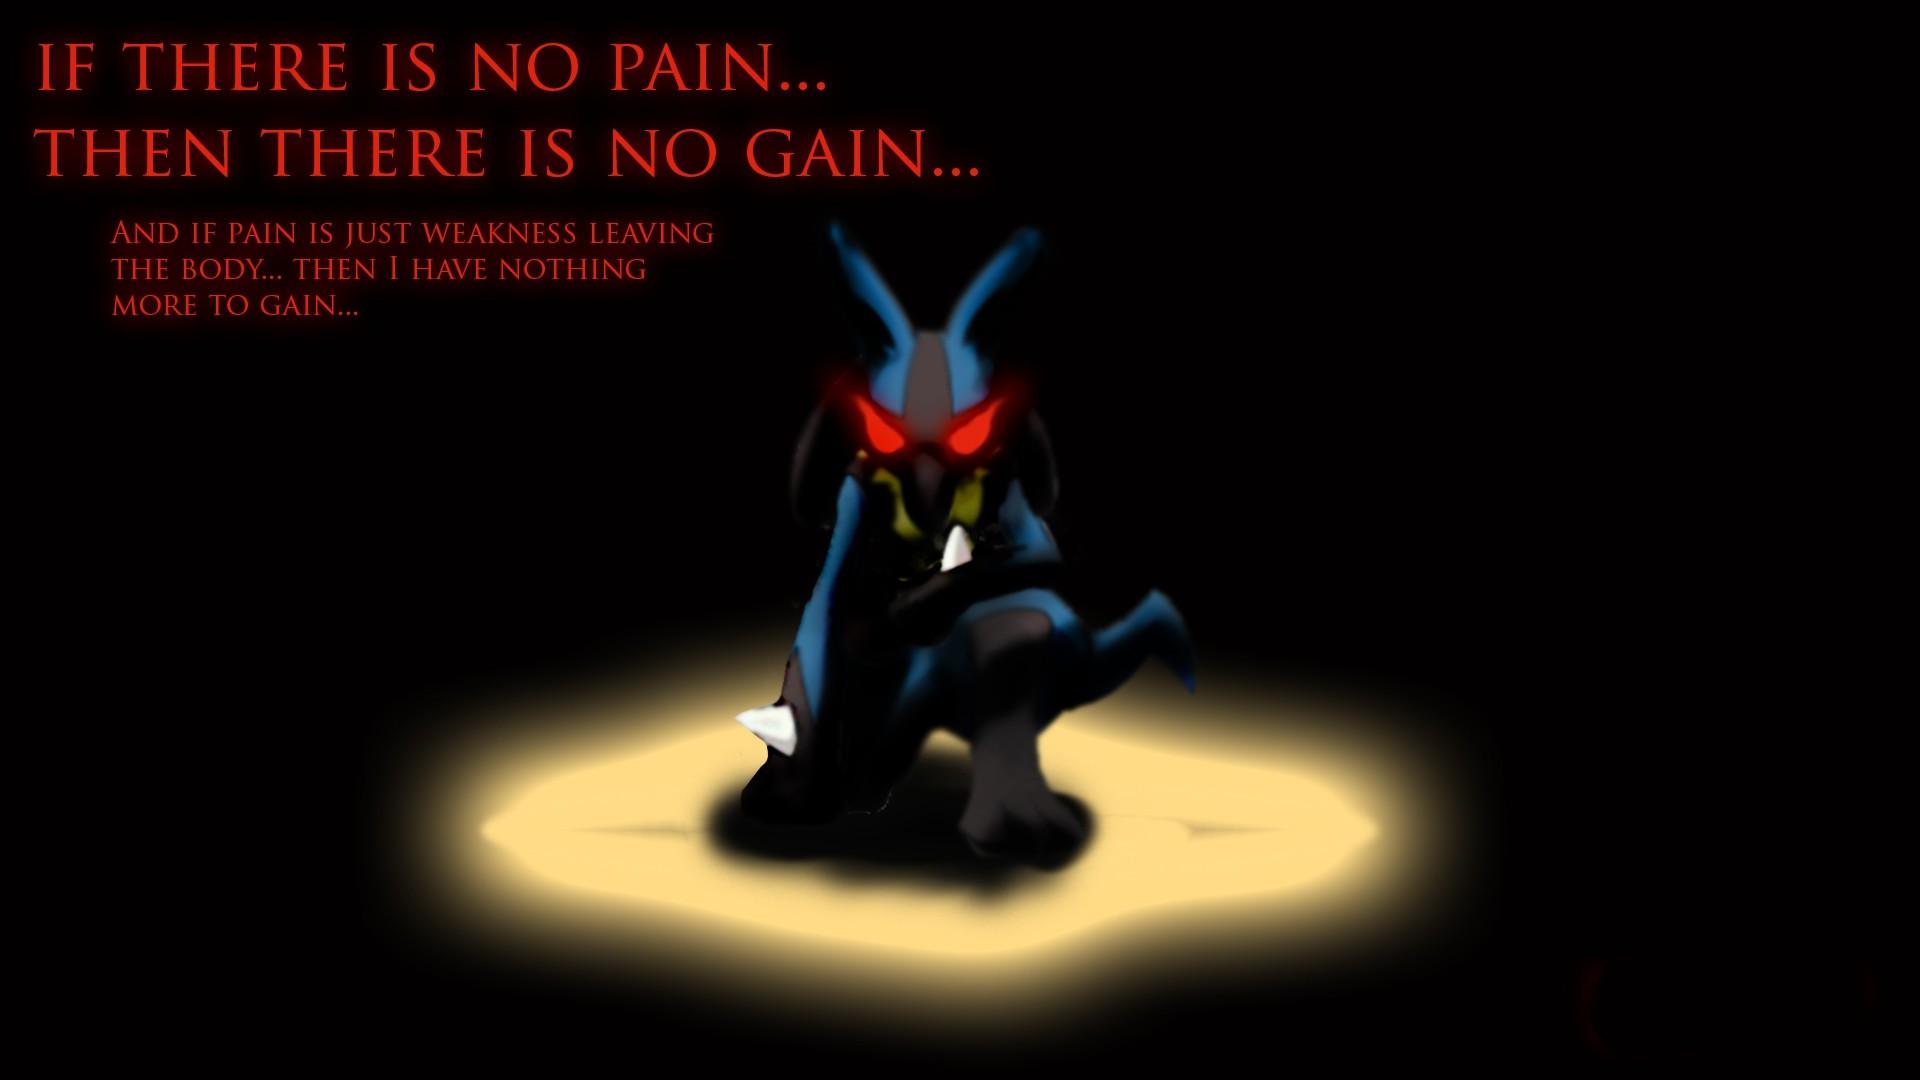 Res: 1920x1080, Free Download Pokemon Lucario Image.